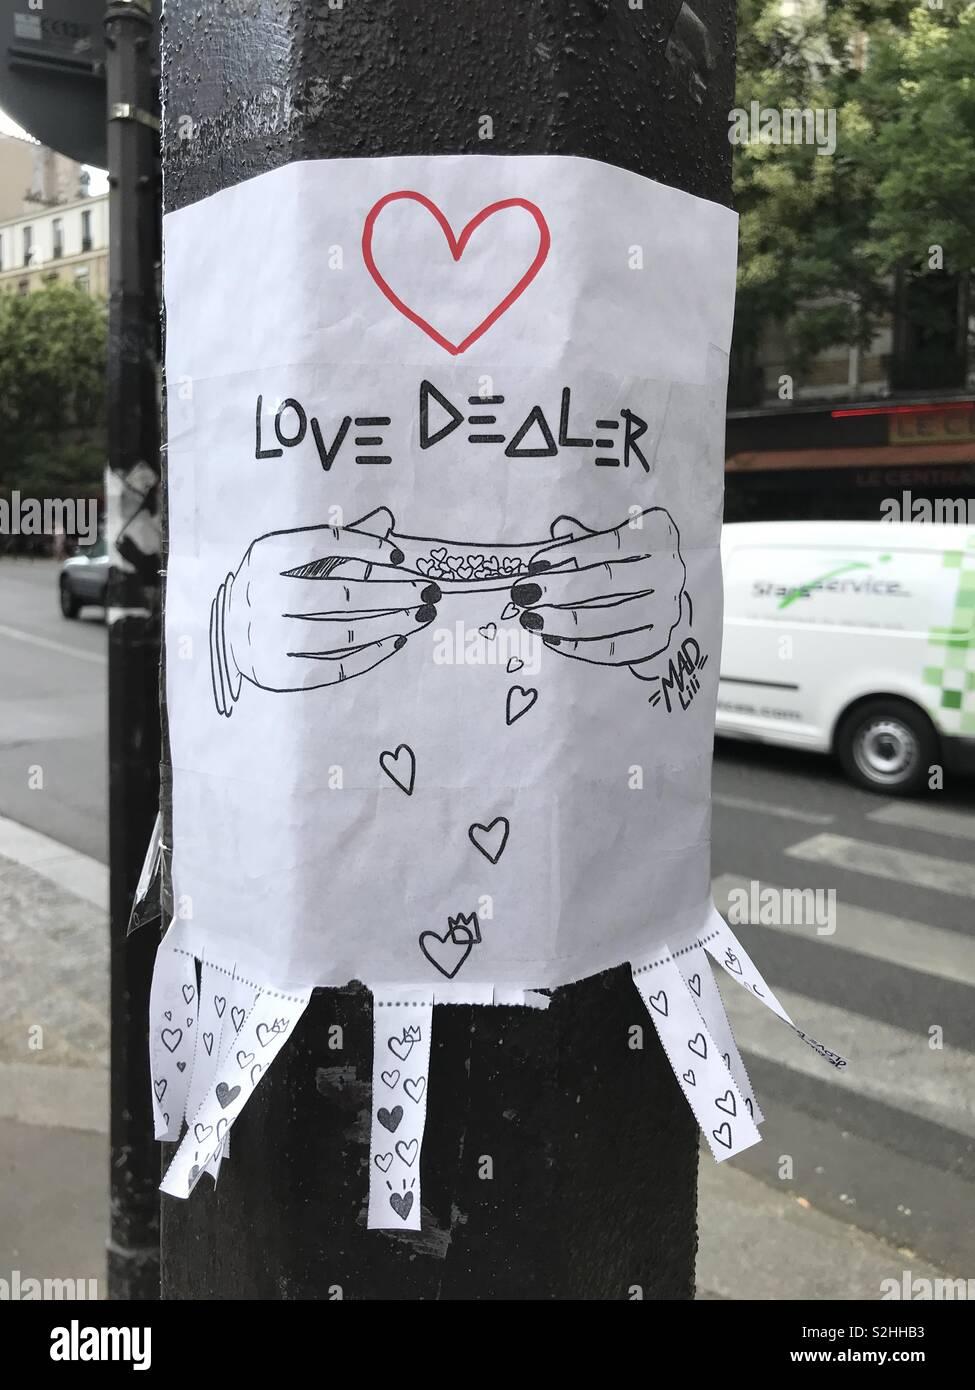 A love dealer sign along the street - Stock Image